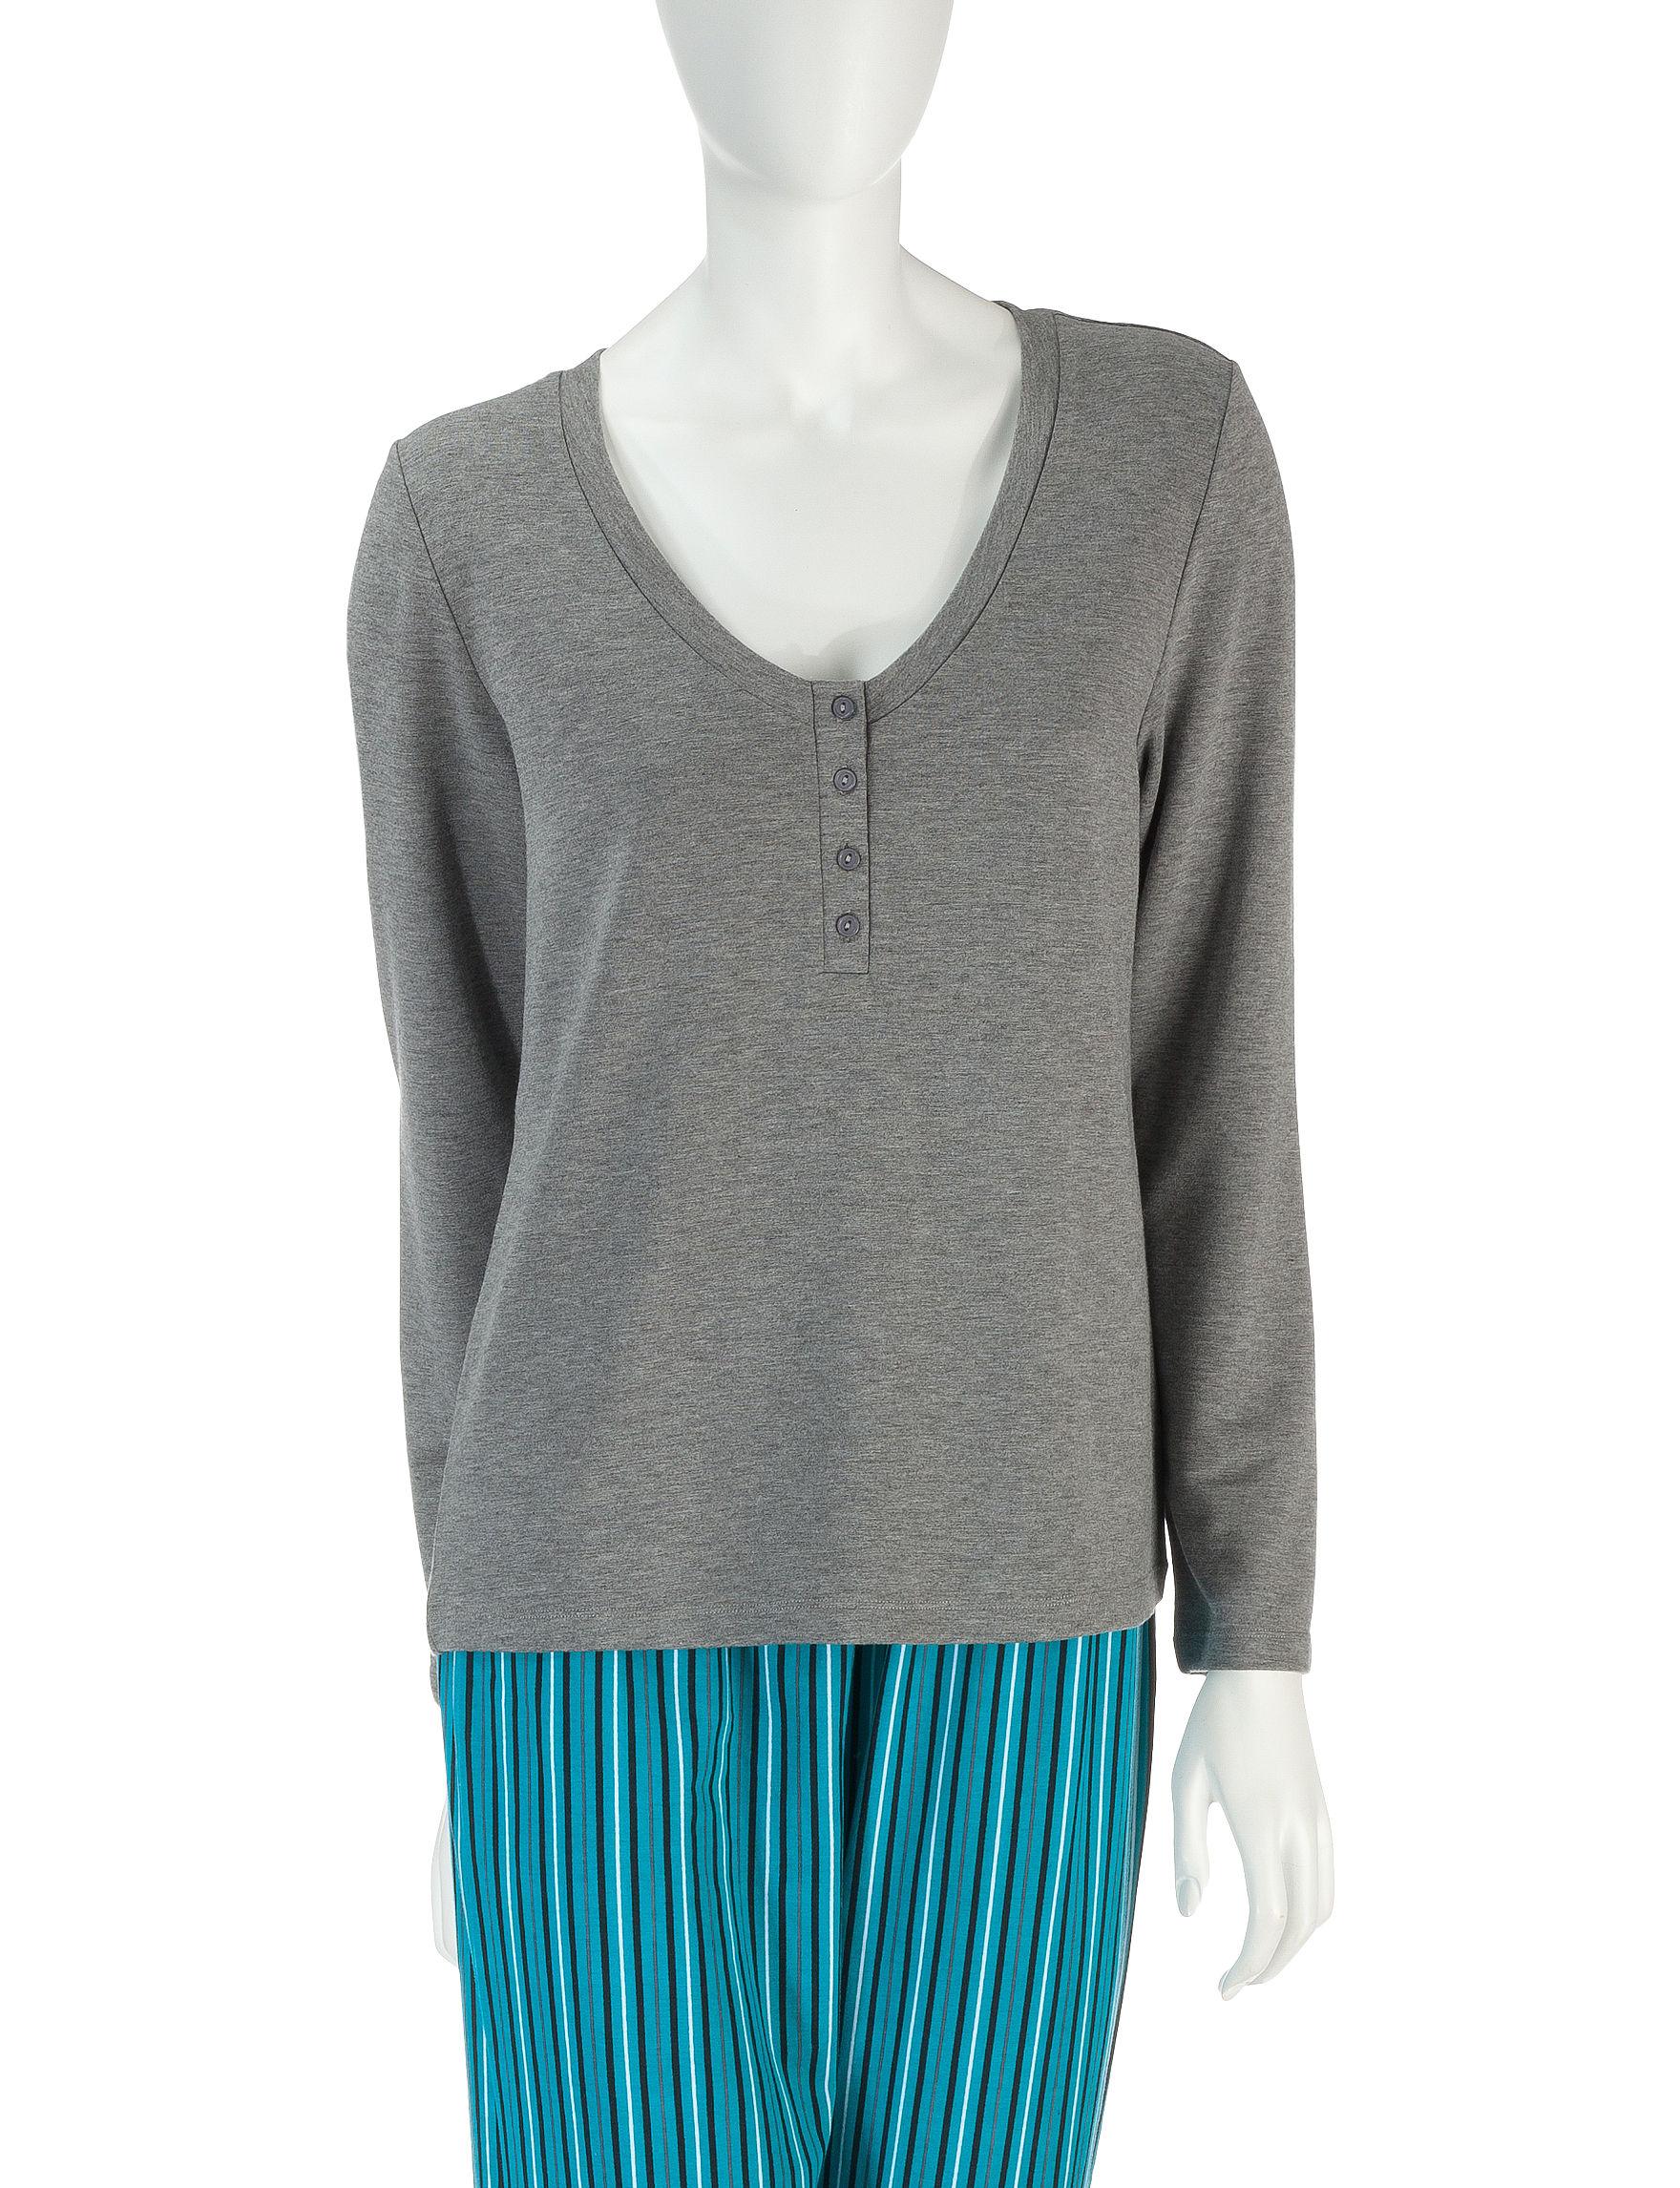 Laura Ashley Grey Pajama Tops